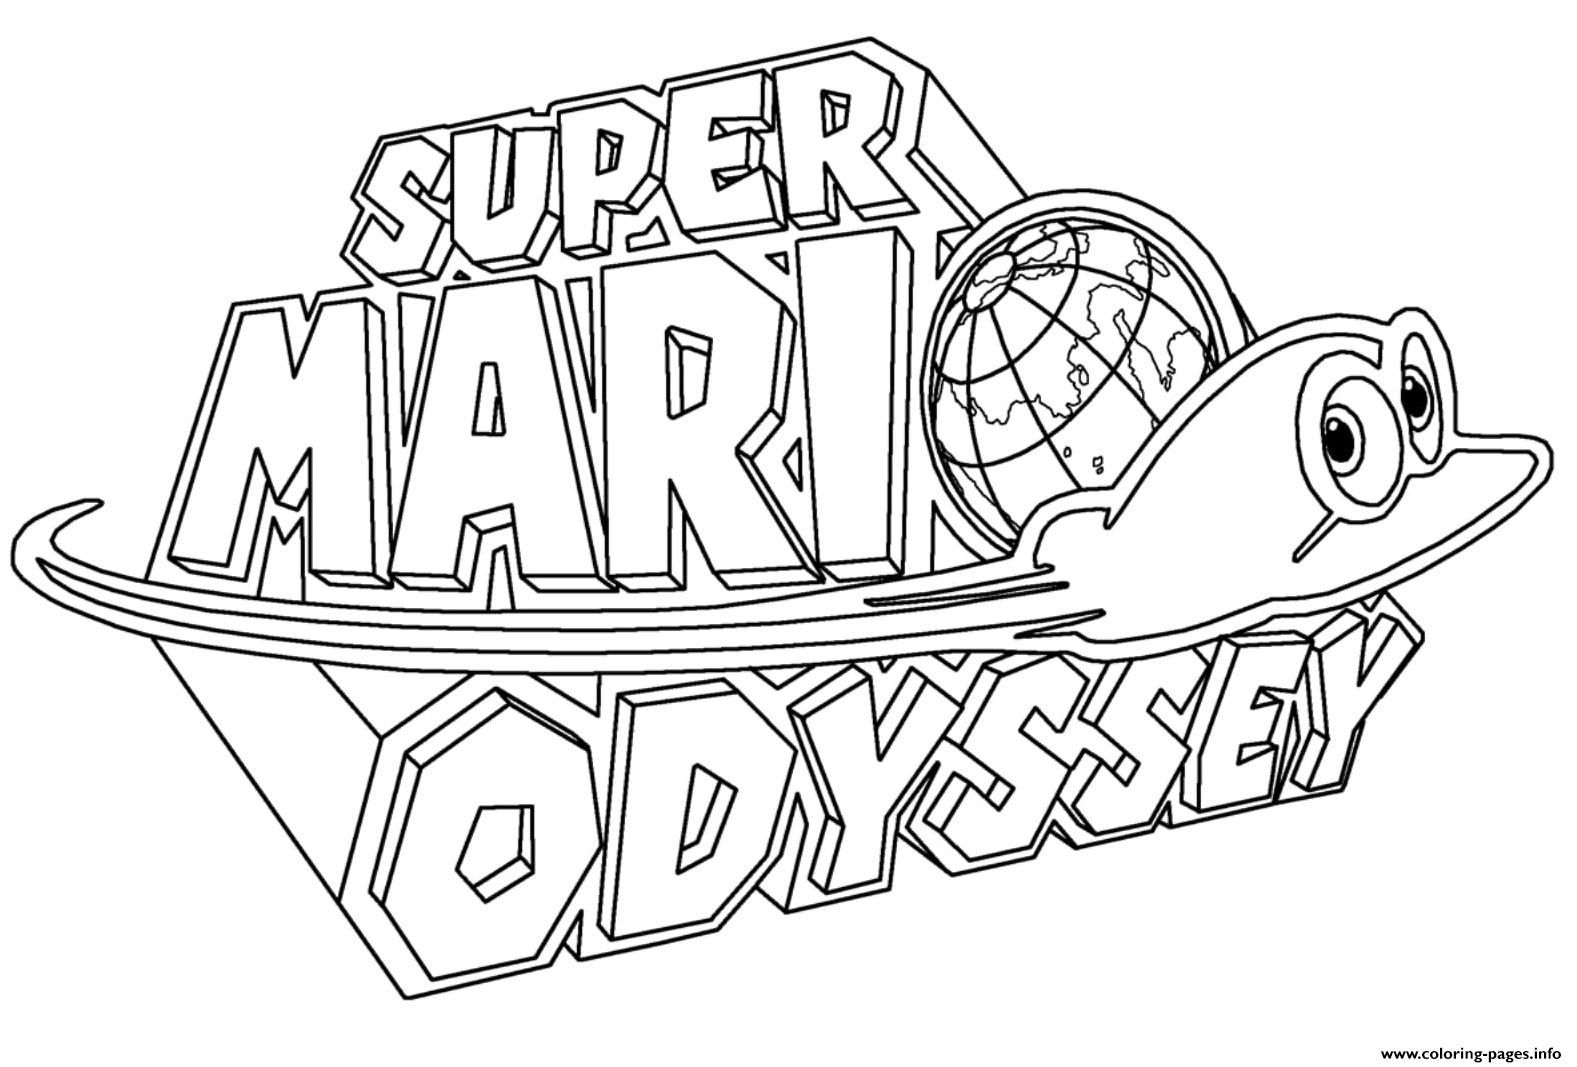 Print Super Mario Odyssey Logo Nintendo Coloring Pages In 2021 Super Mario Coloring Pages Mario Coloring Pages Coloring Pages